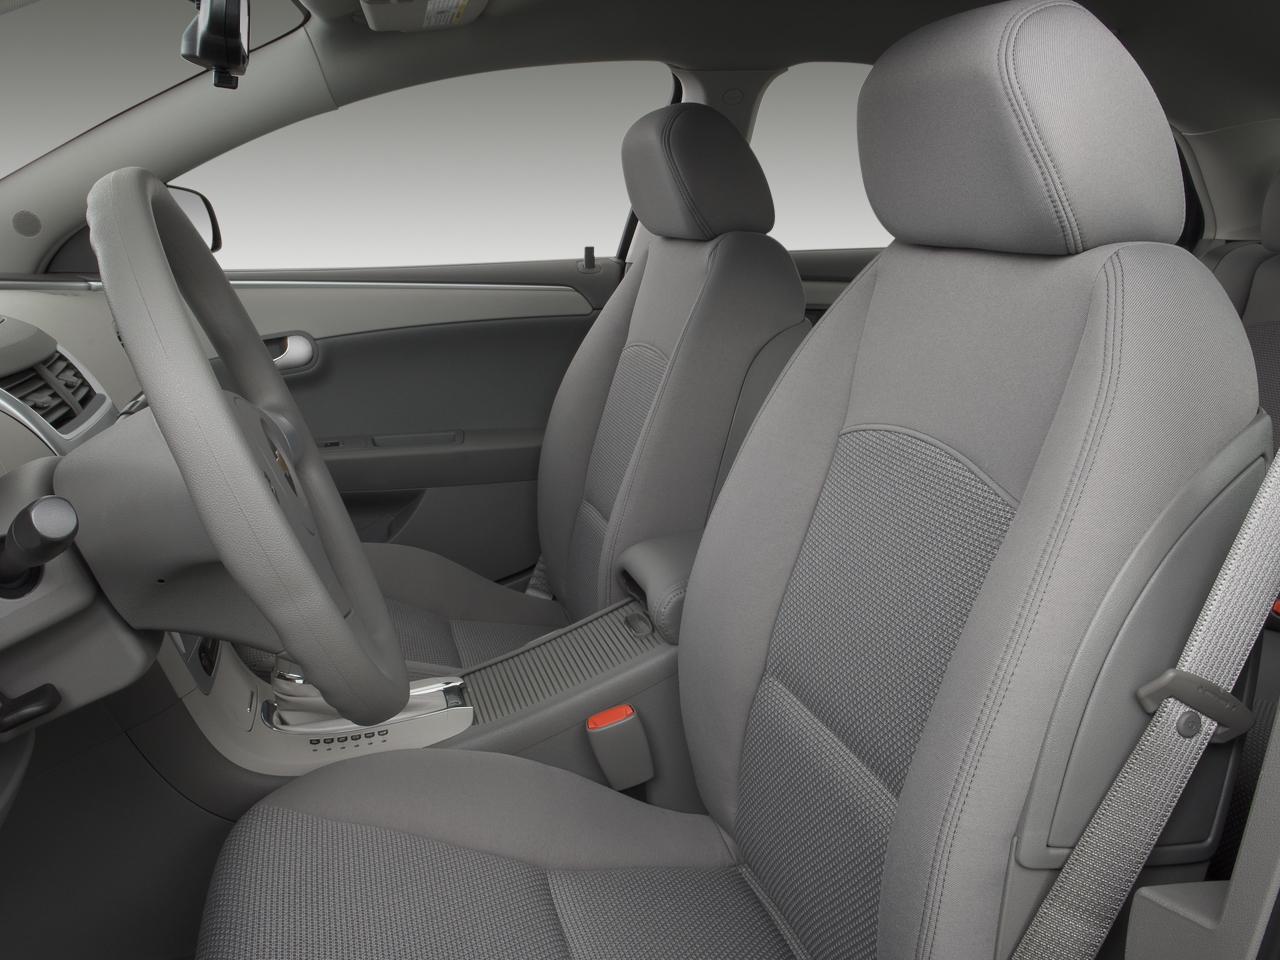 Chevy Malibu Seat Diagram Electrical Wiring Diagrams 2007 2009 Parts Auto U2022 2011